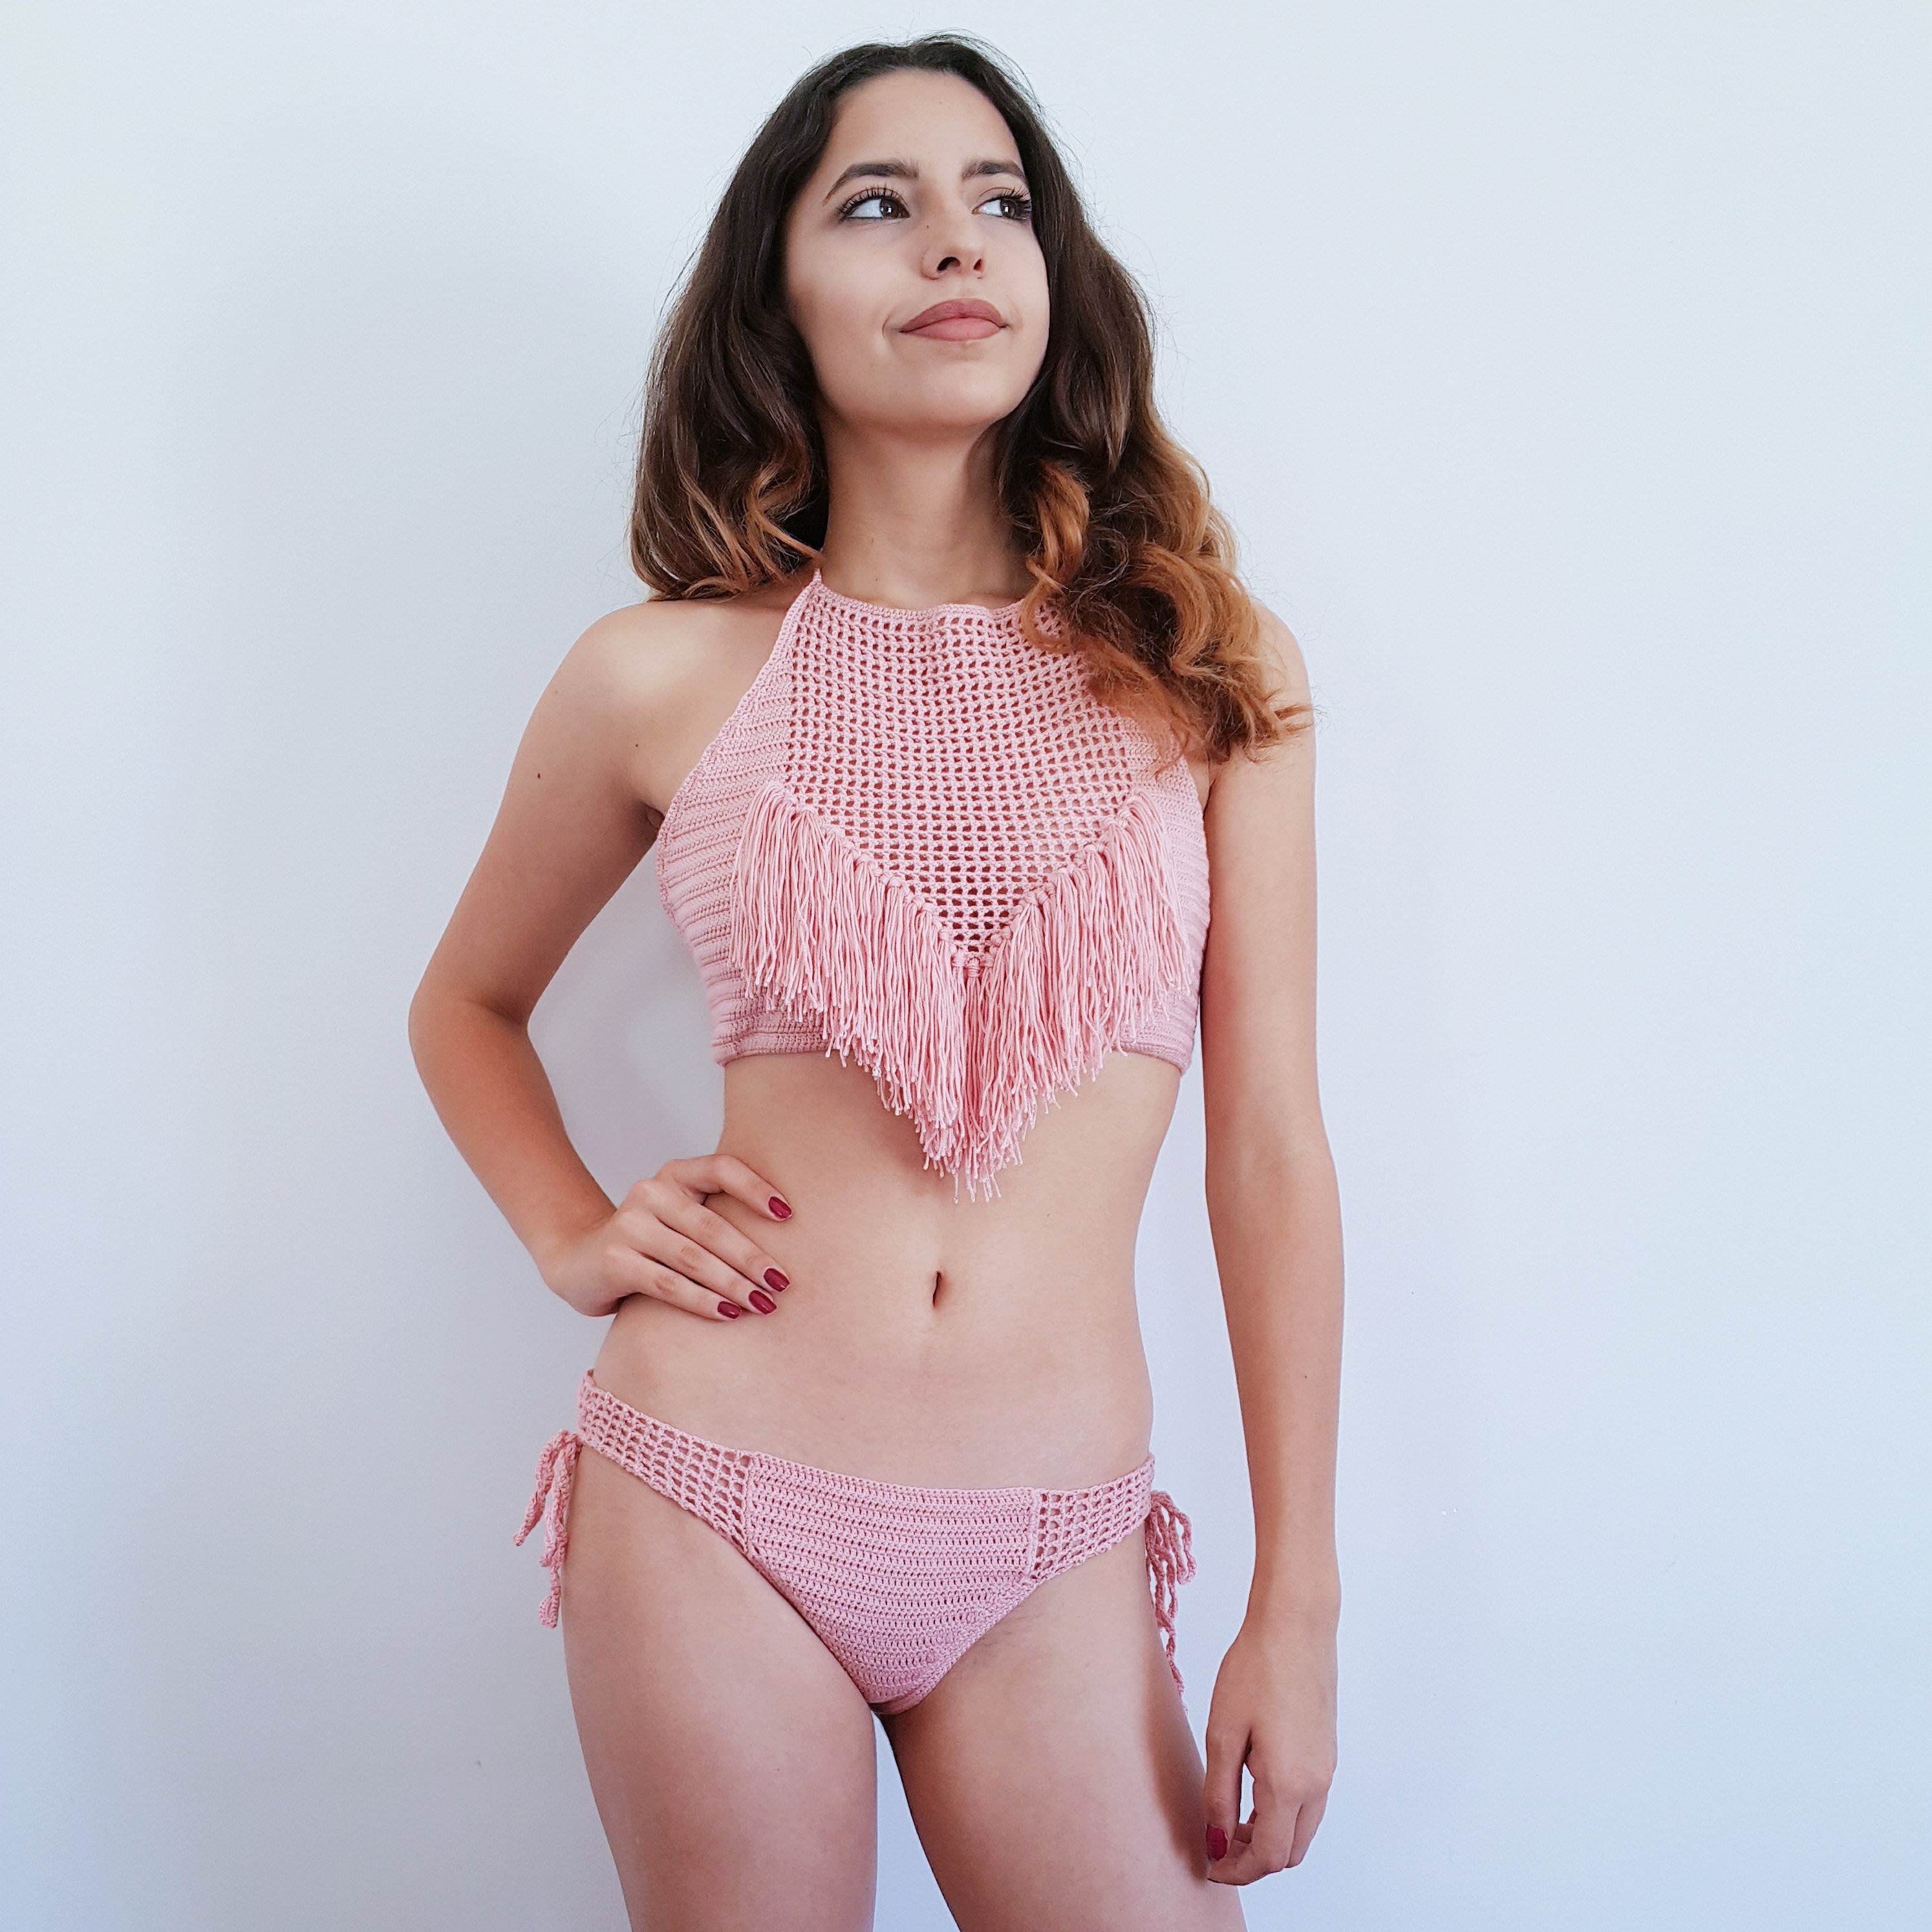 d61132792cfe1 Pink Crochet Bikini Fringe Bikini Top Halter Top Brazilian | Etsy